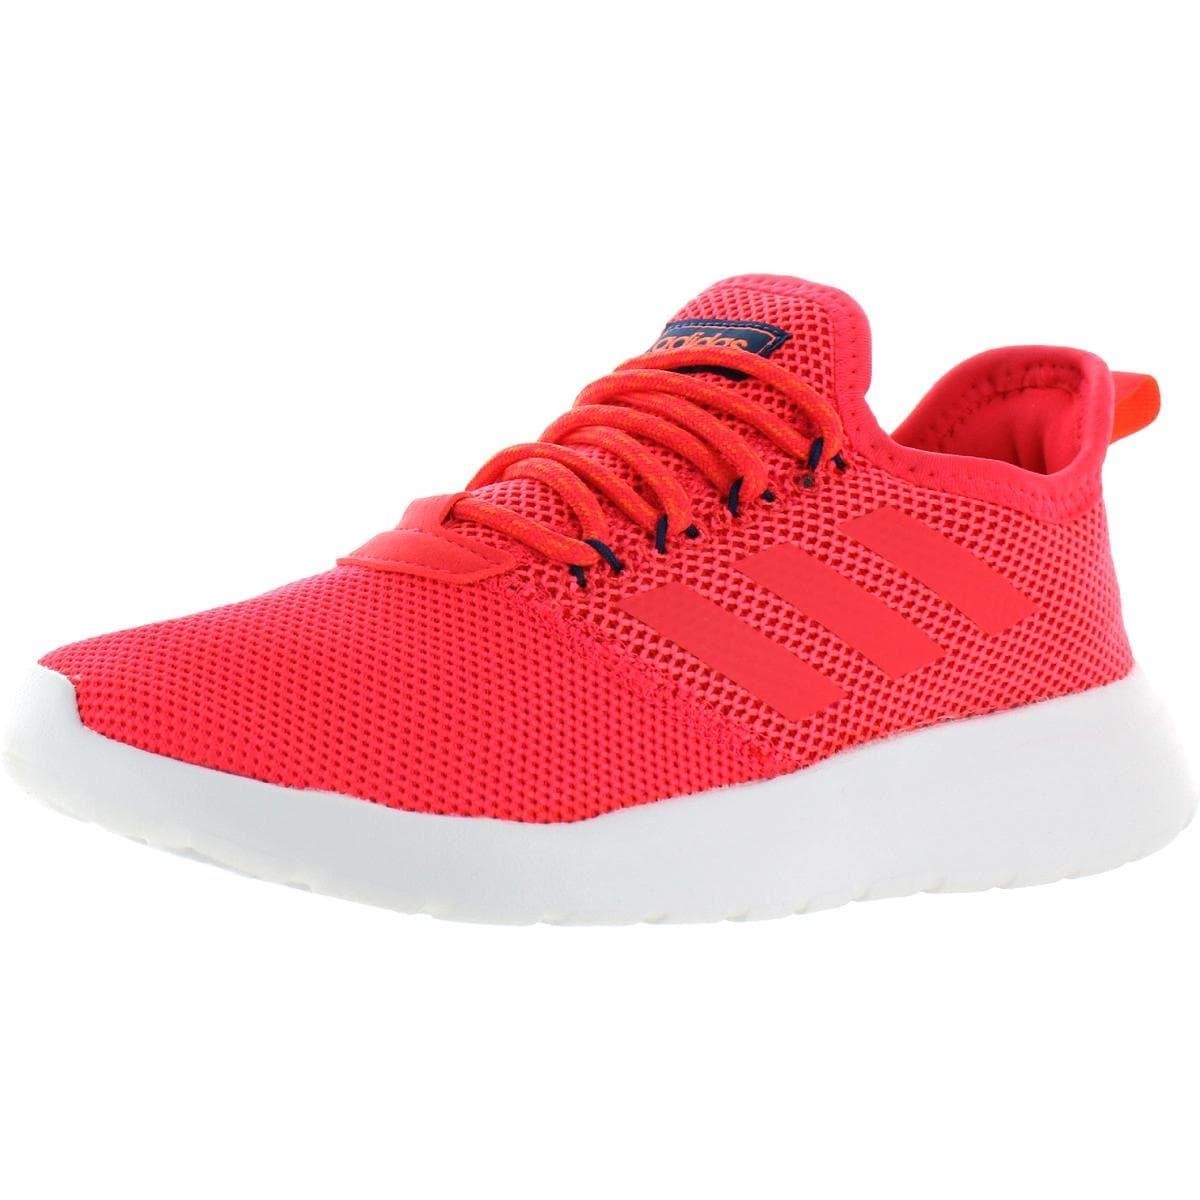 Adidas Womens Lite Racer RBN Sneakers